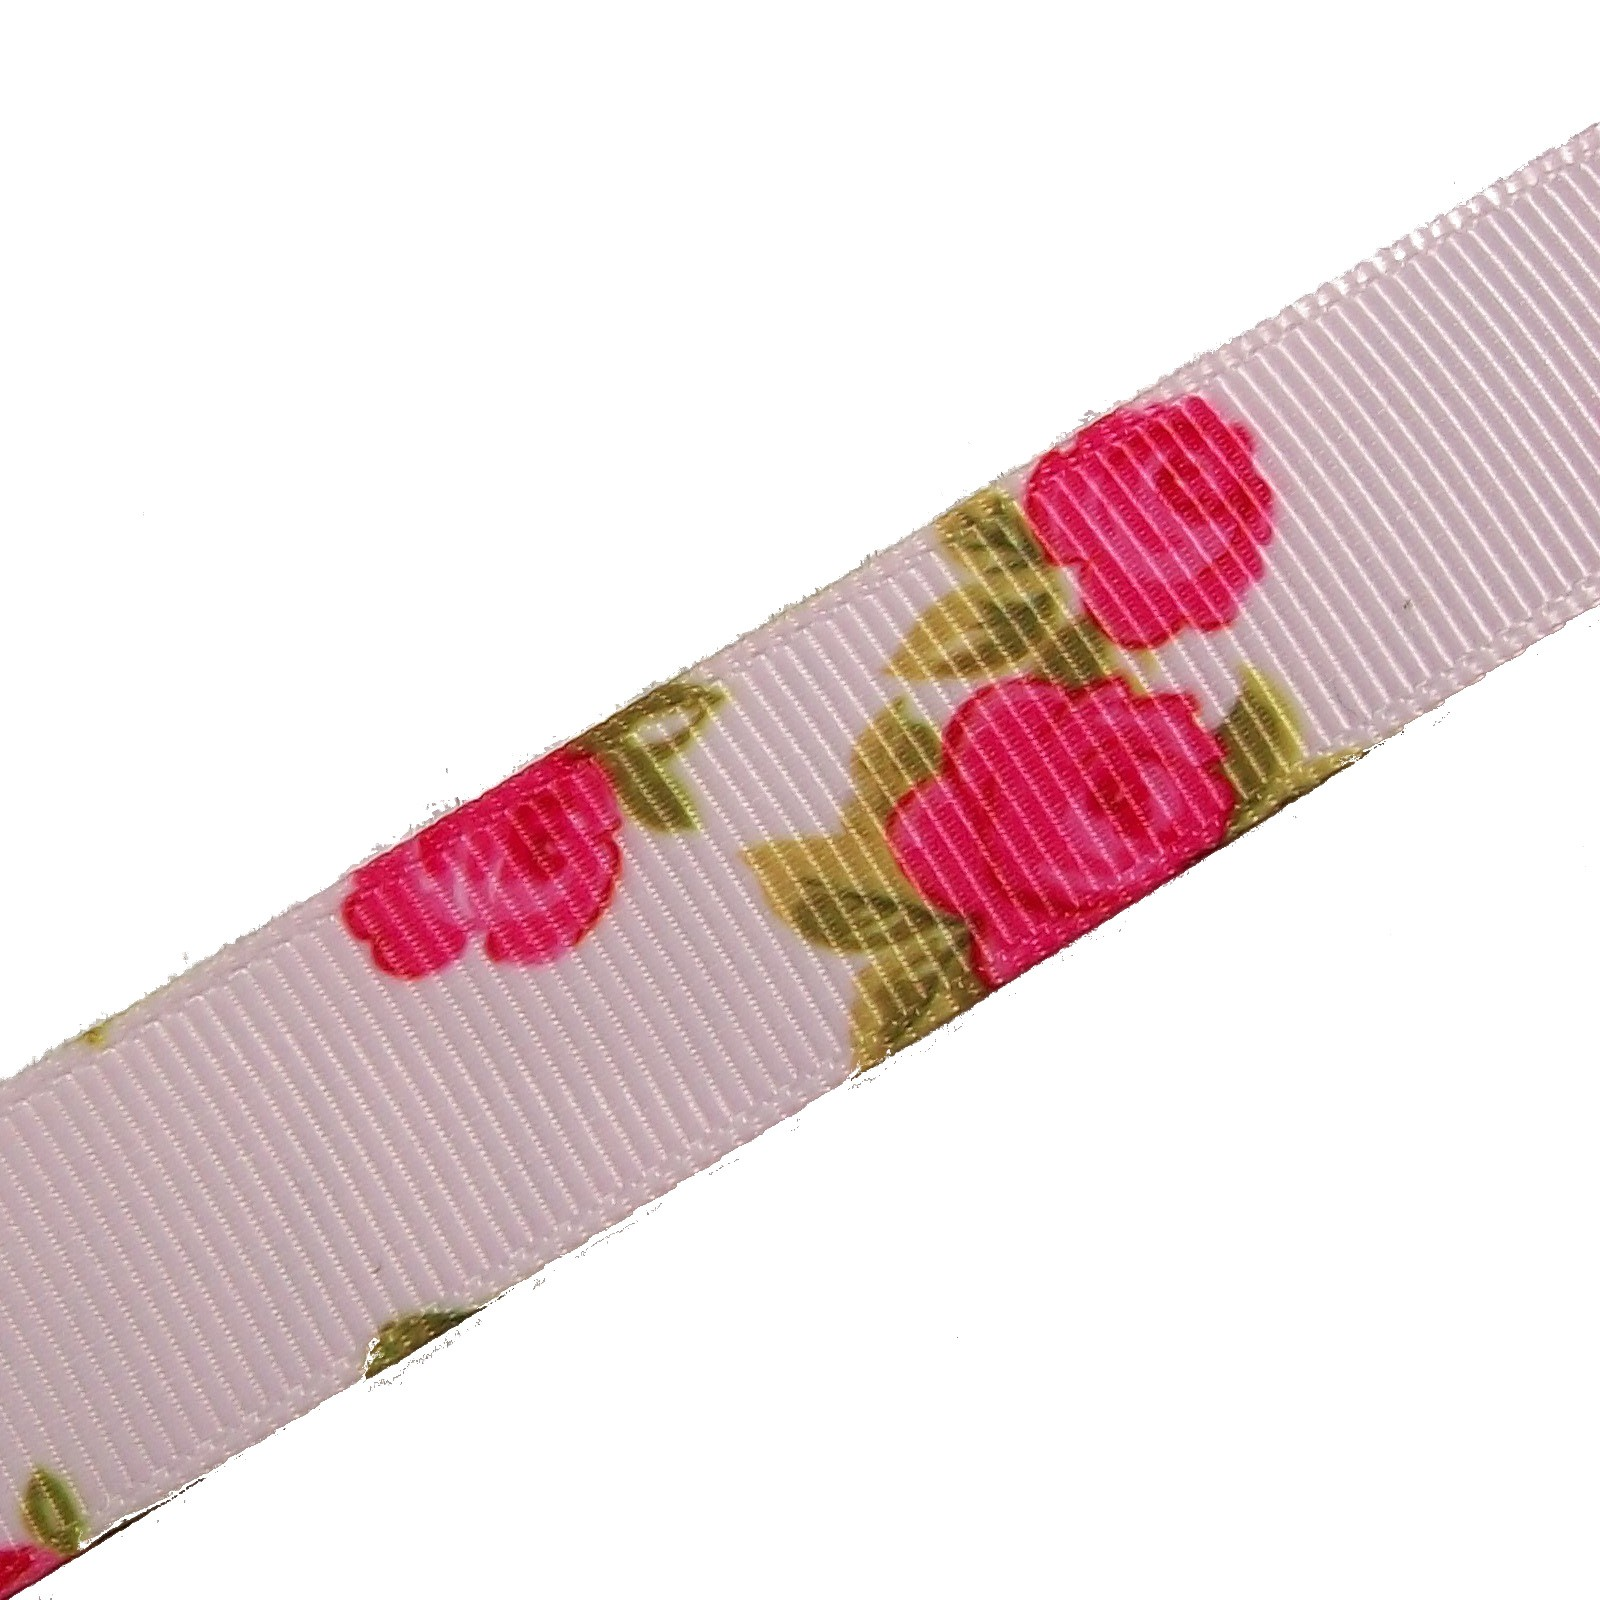 Vintage Style Rose Print Floral Grosgrain Ribbon 25mm wide Pink 2 metre length